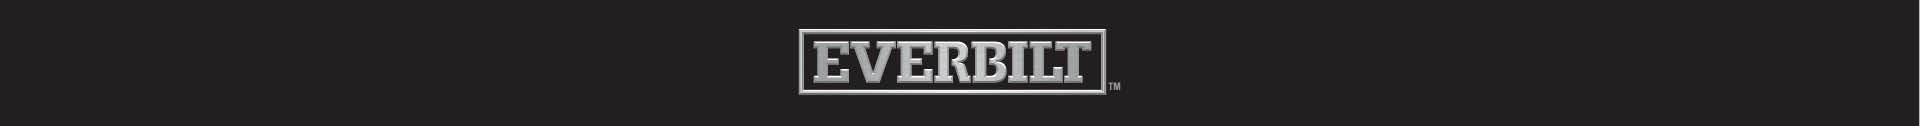 Everbilt brand banner